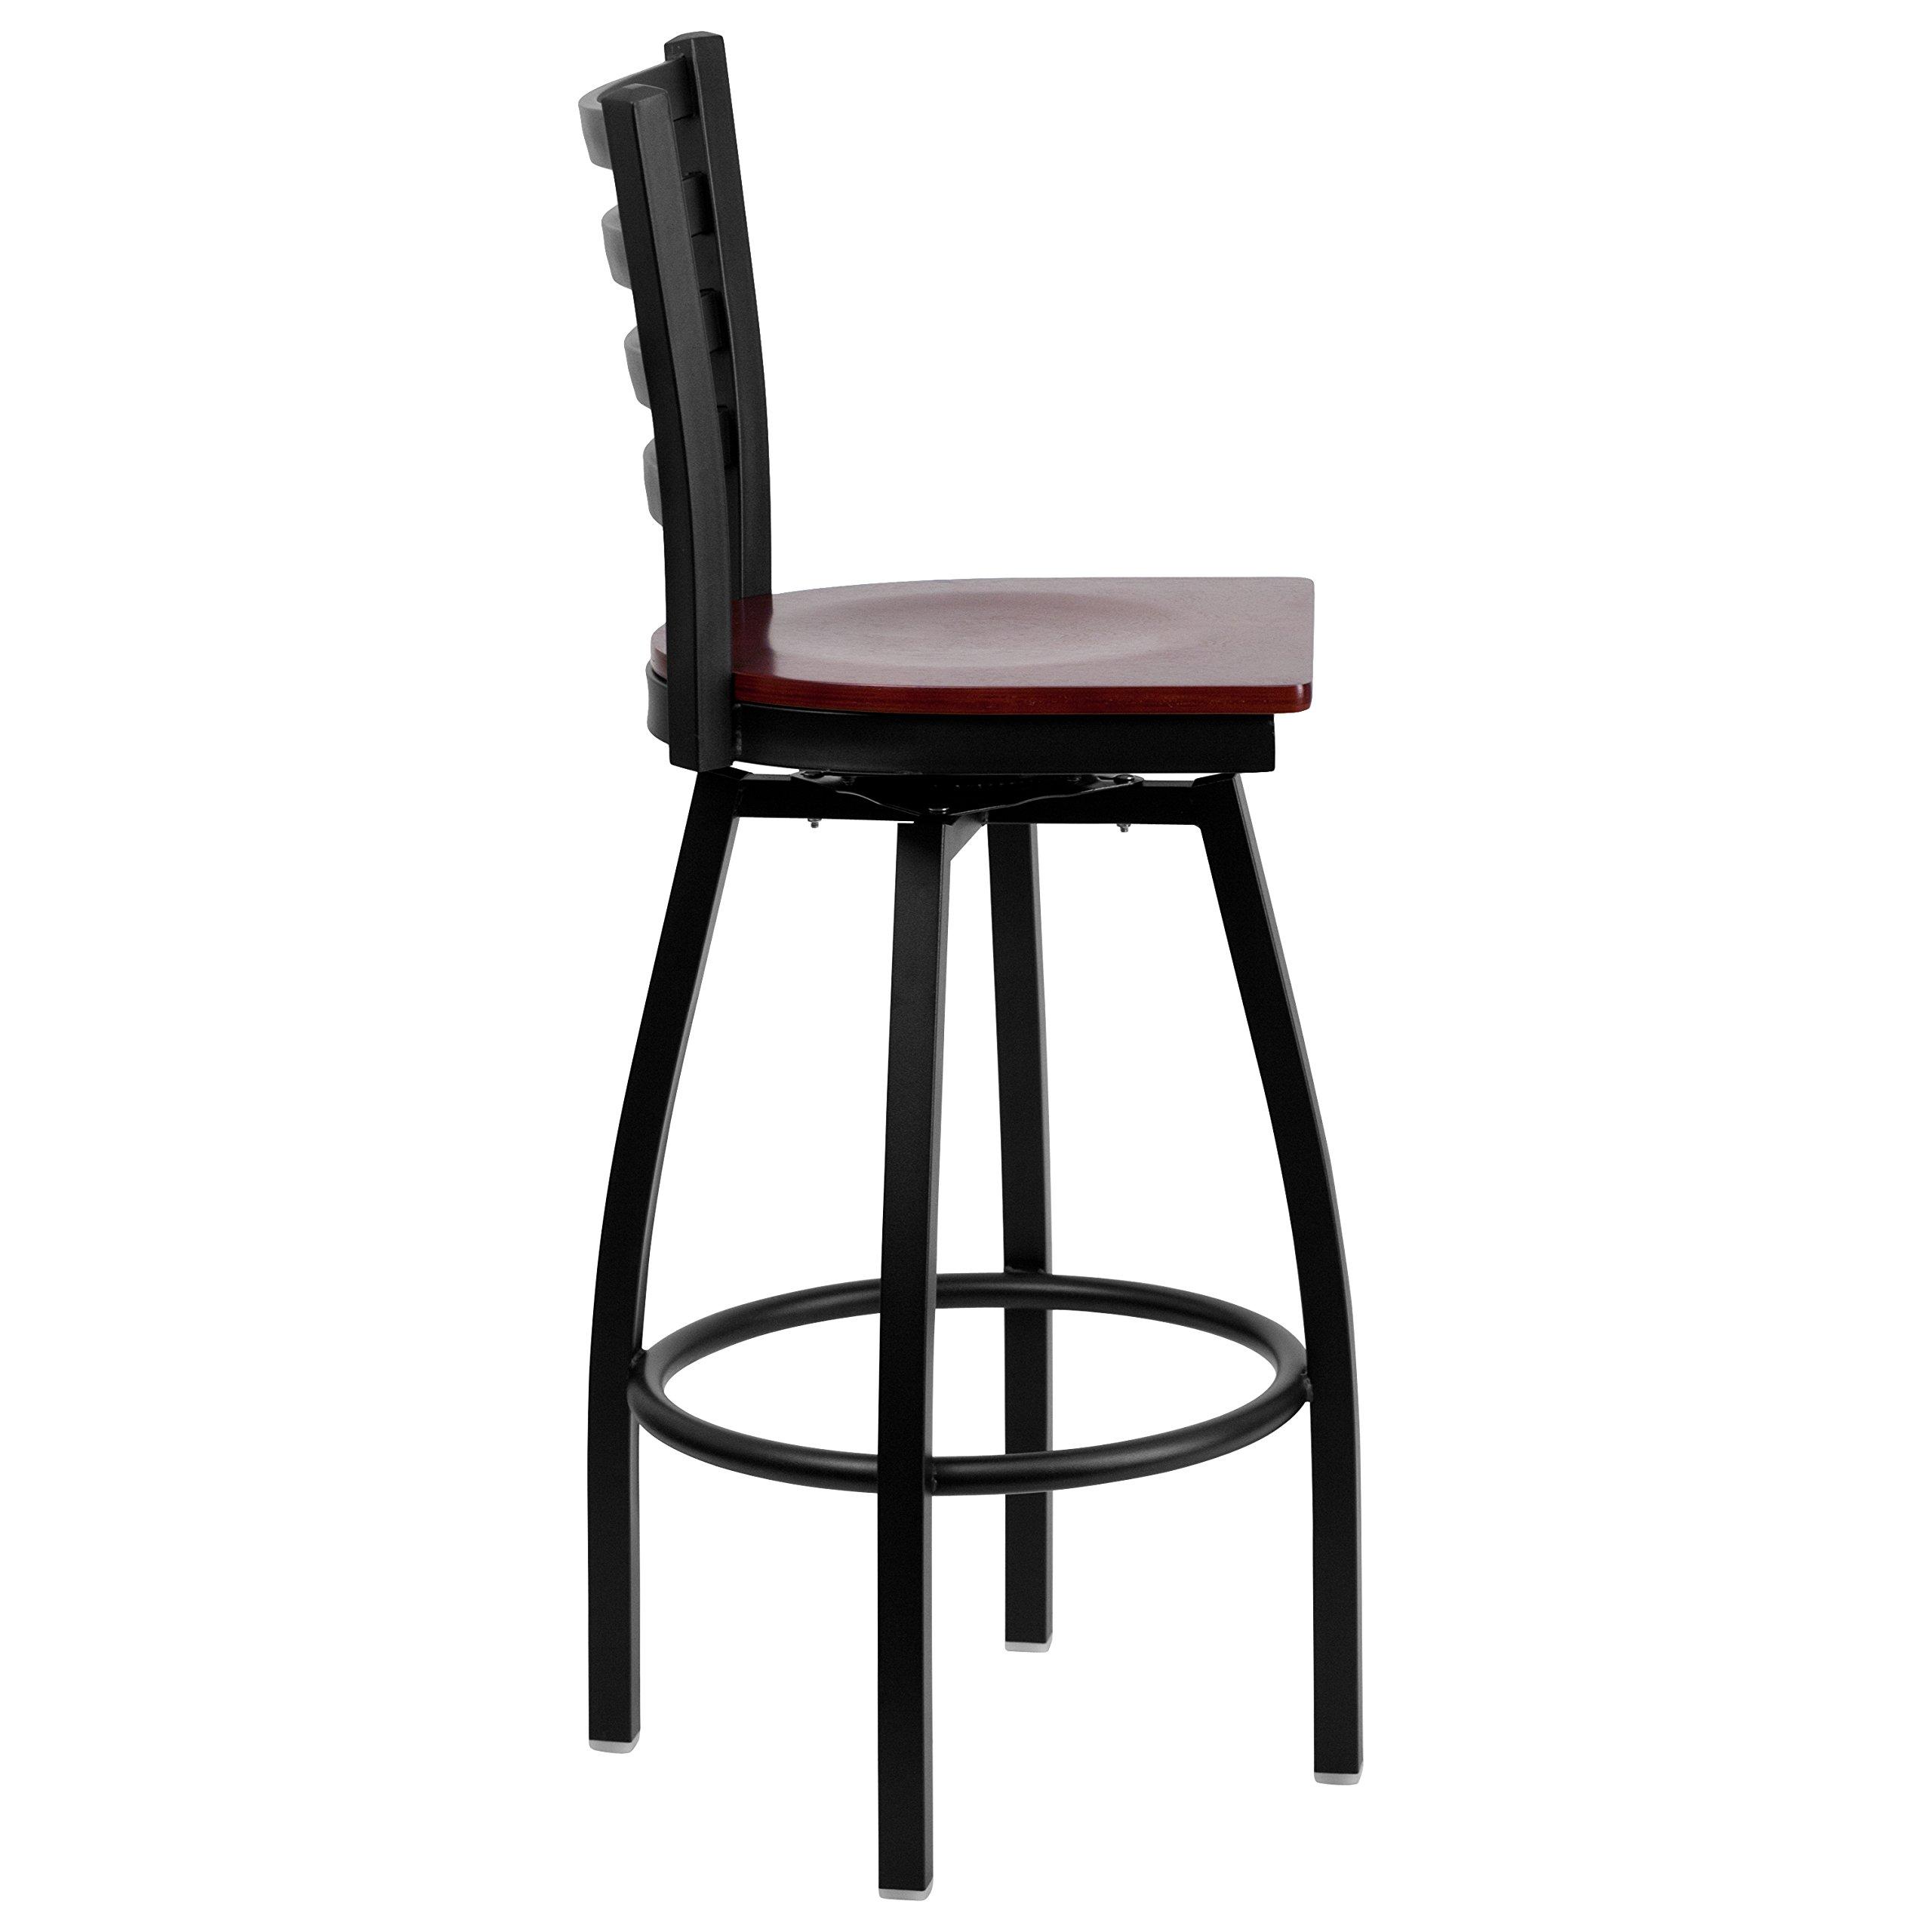 Flash Furniture HERCULES Series Black Ladder Back Swivel Metal Barstool - Mahogany Wood Seat by Flash Furniture (Image #2)